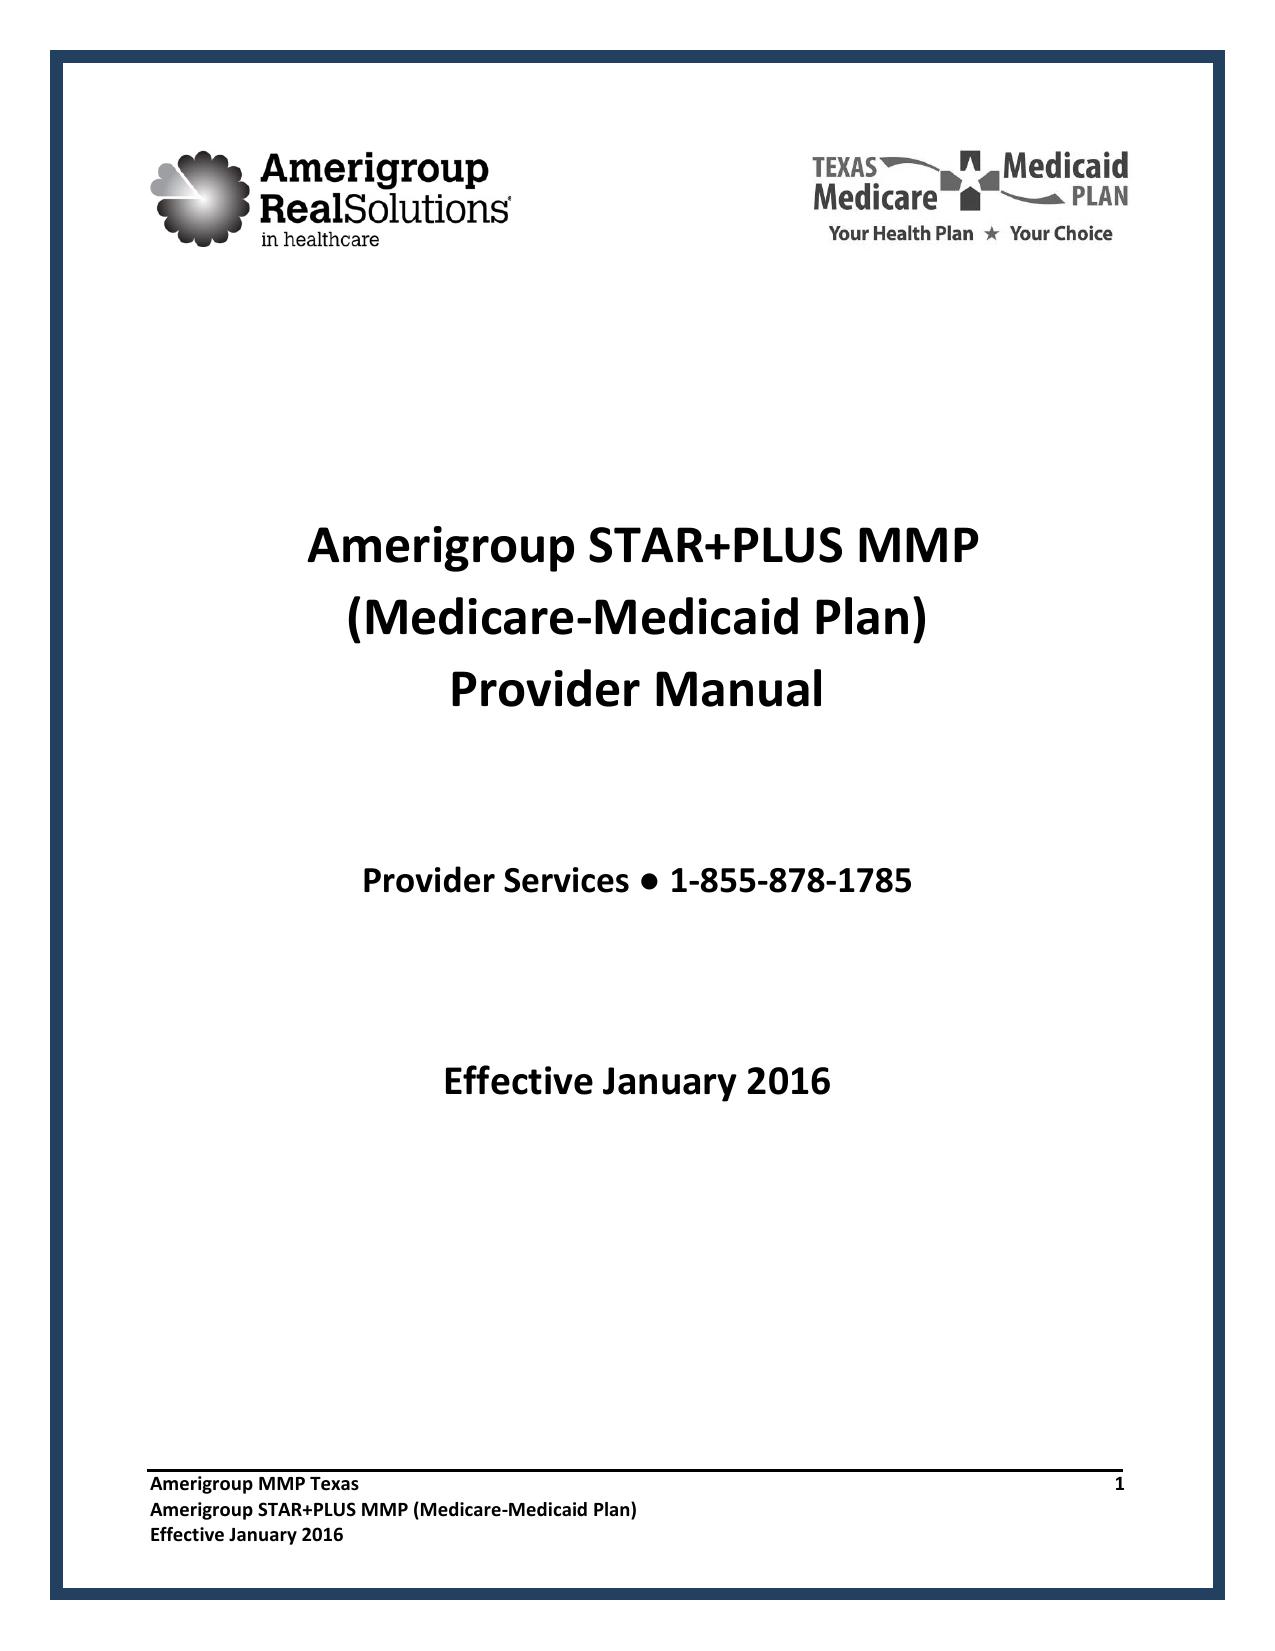 Amerigroup STAR+PLUS MMP (Medicare